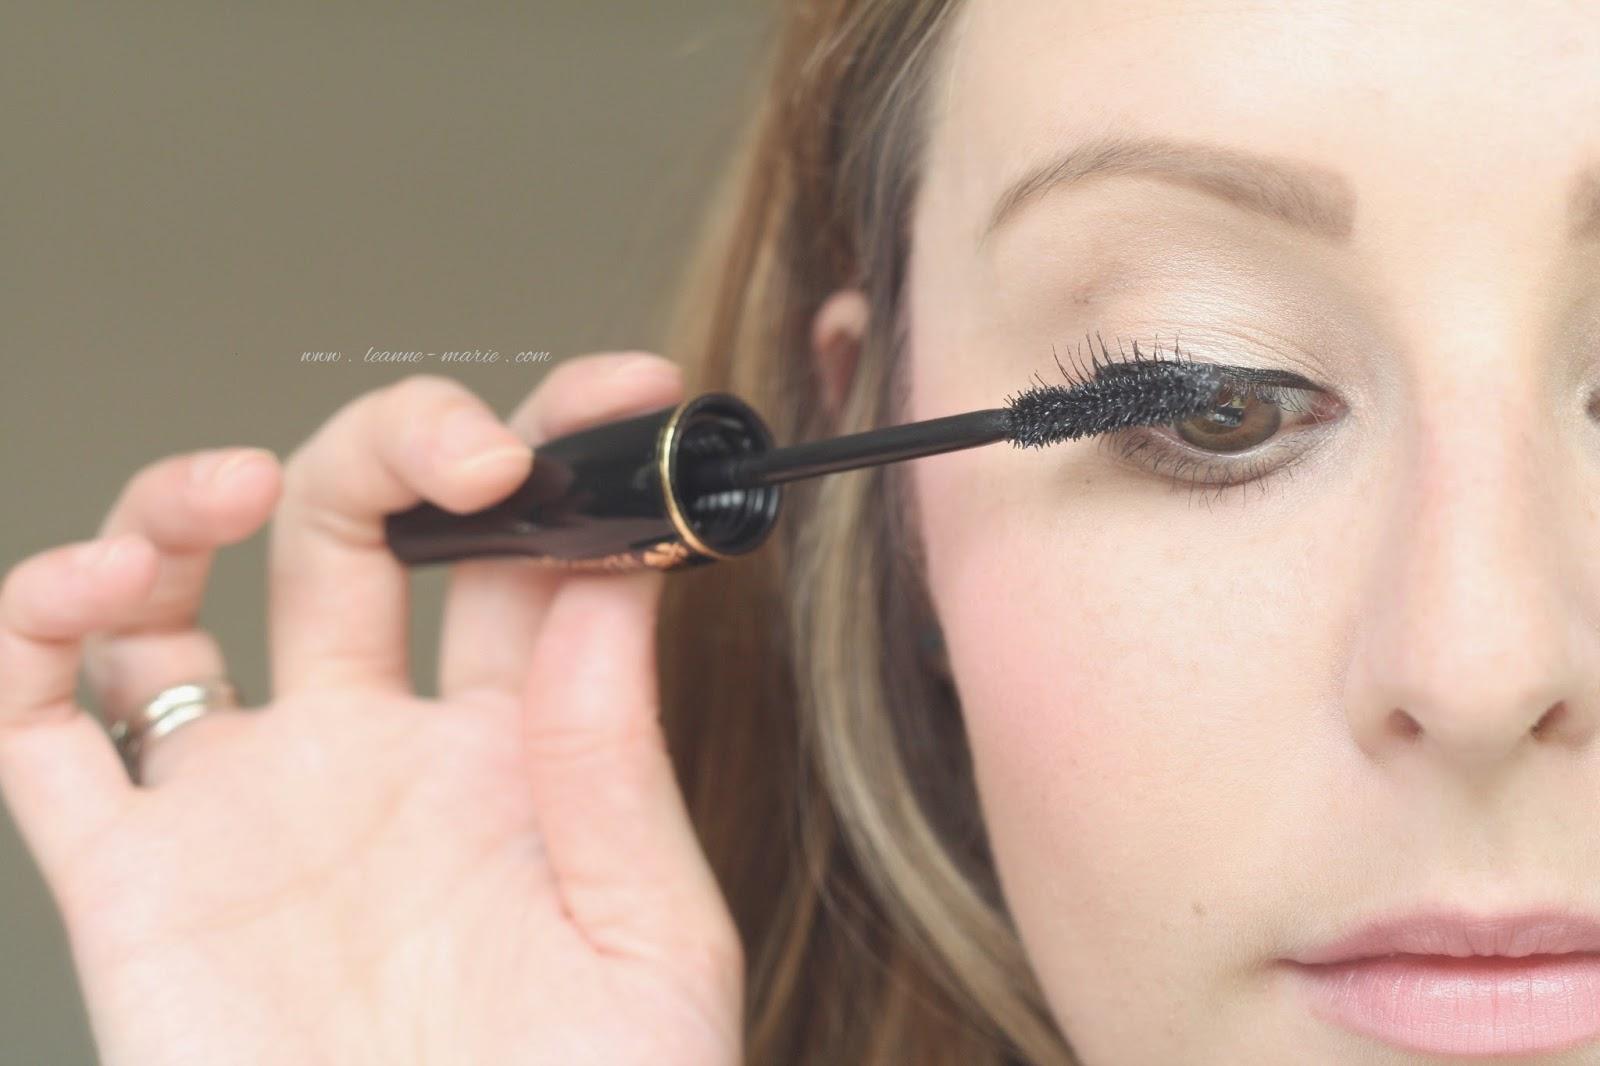 Applying-mascara-Lancome-Hypnose-Beauty-Blog